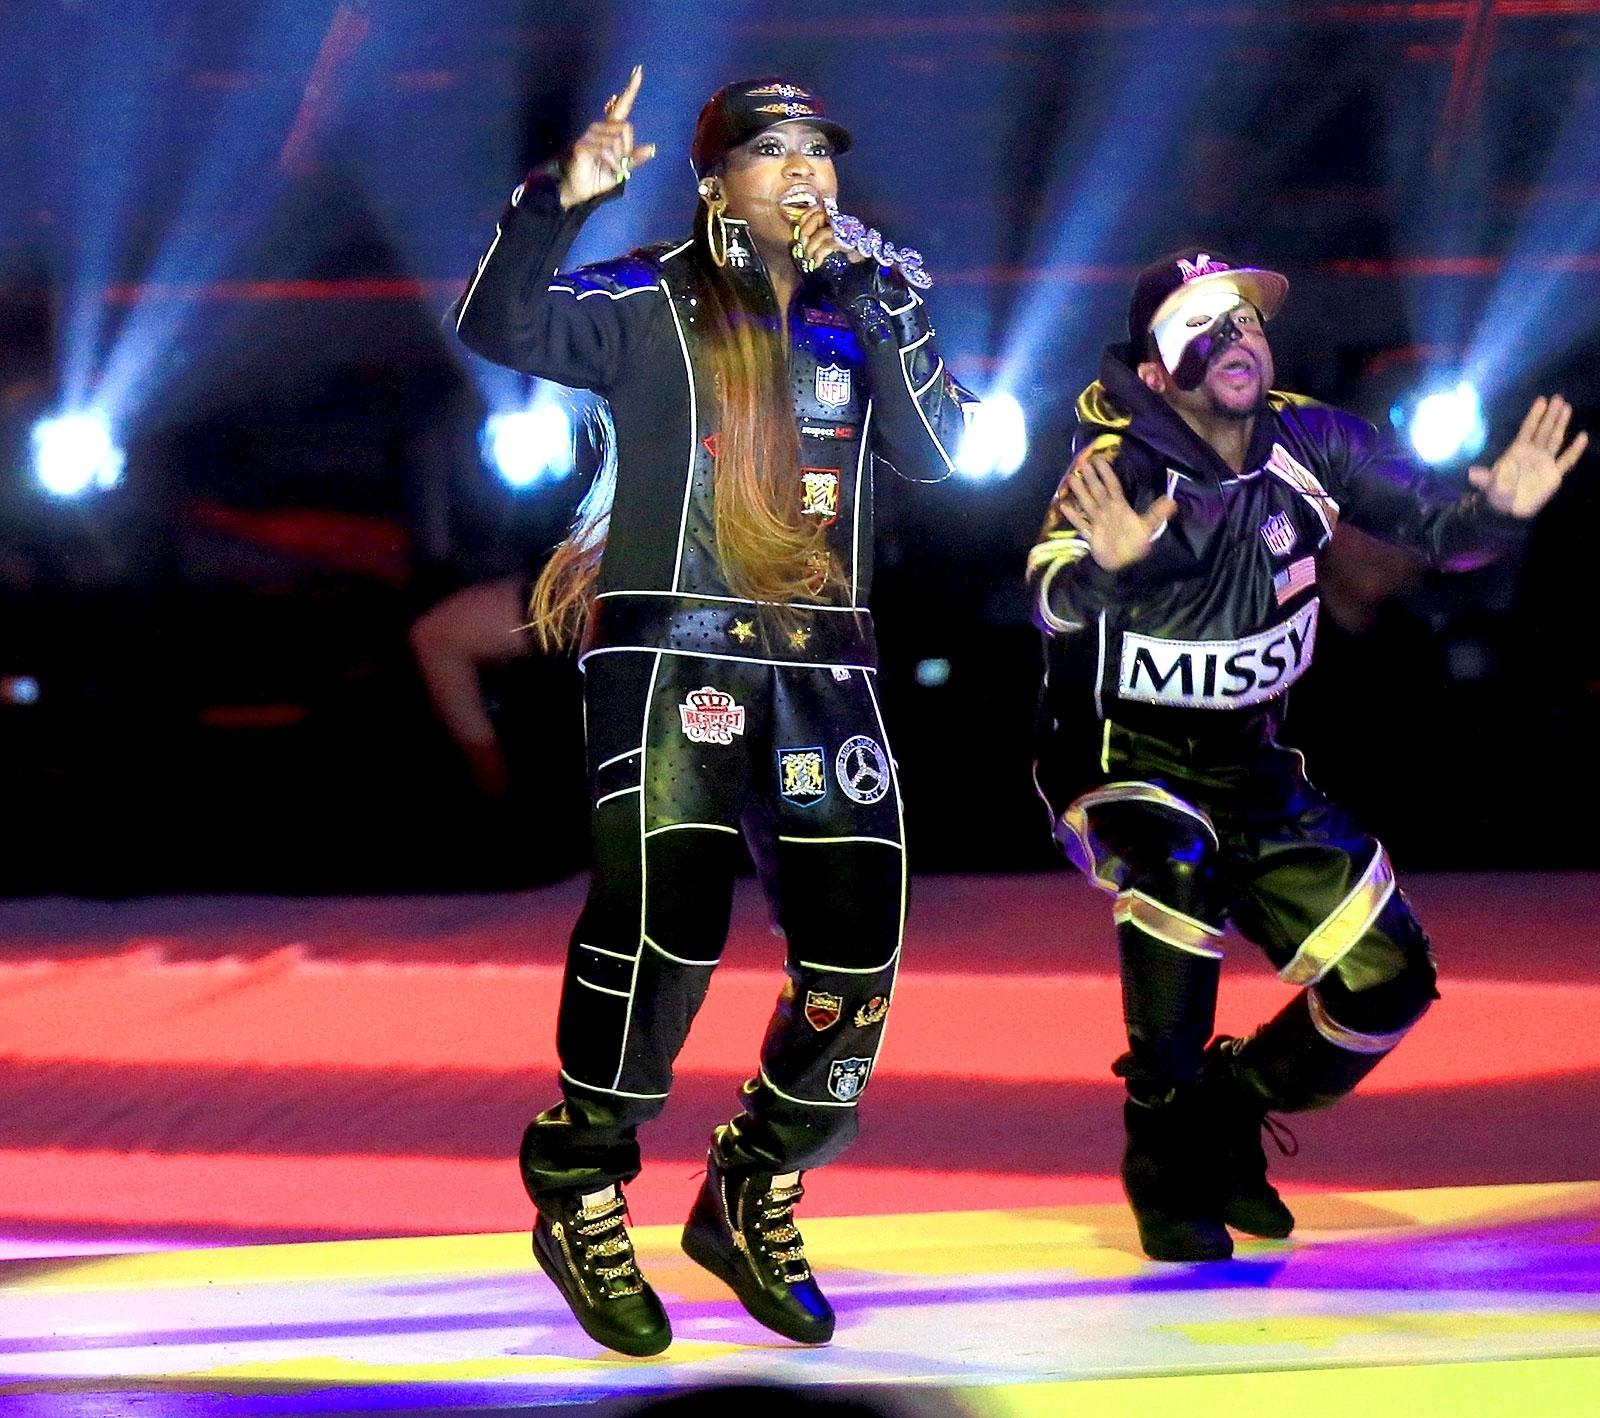 Hot 97.1 Svg » 10 Years On Top » Missy Elliott Sees Huge pertaining to Missy Elliott Super Bowl